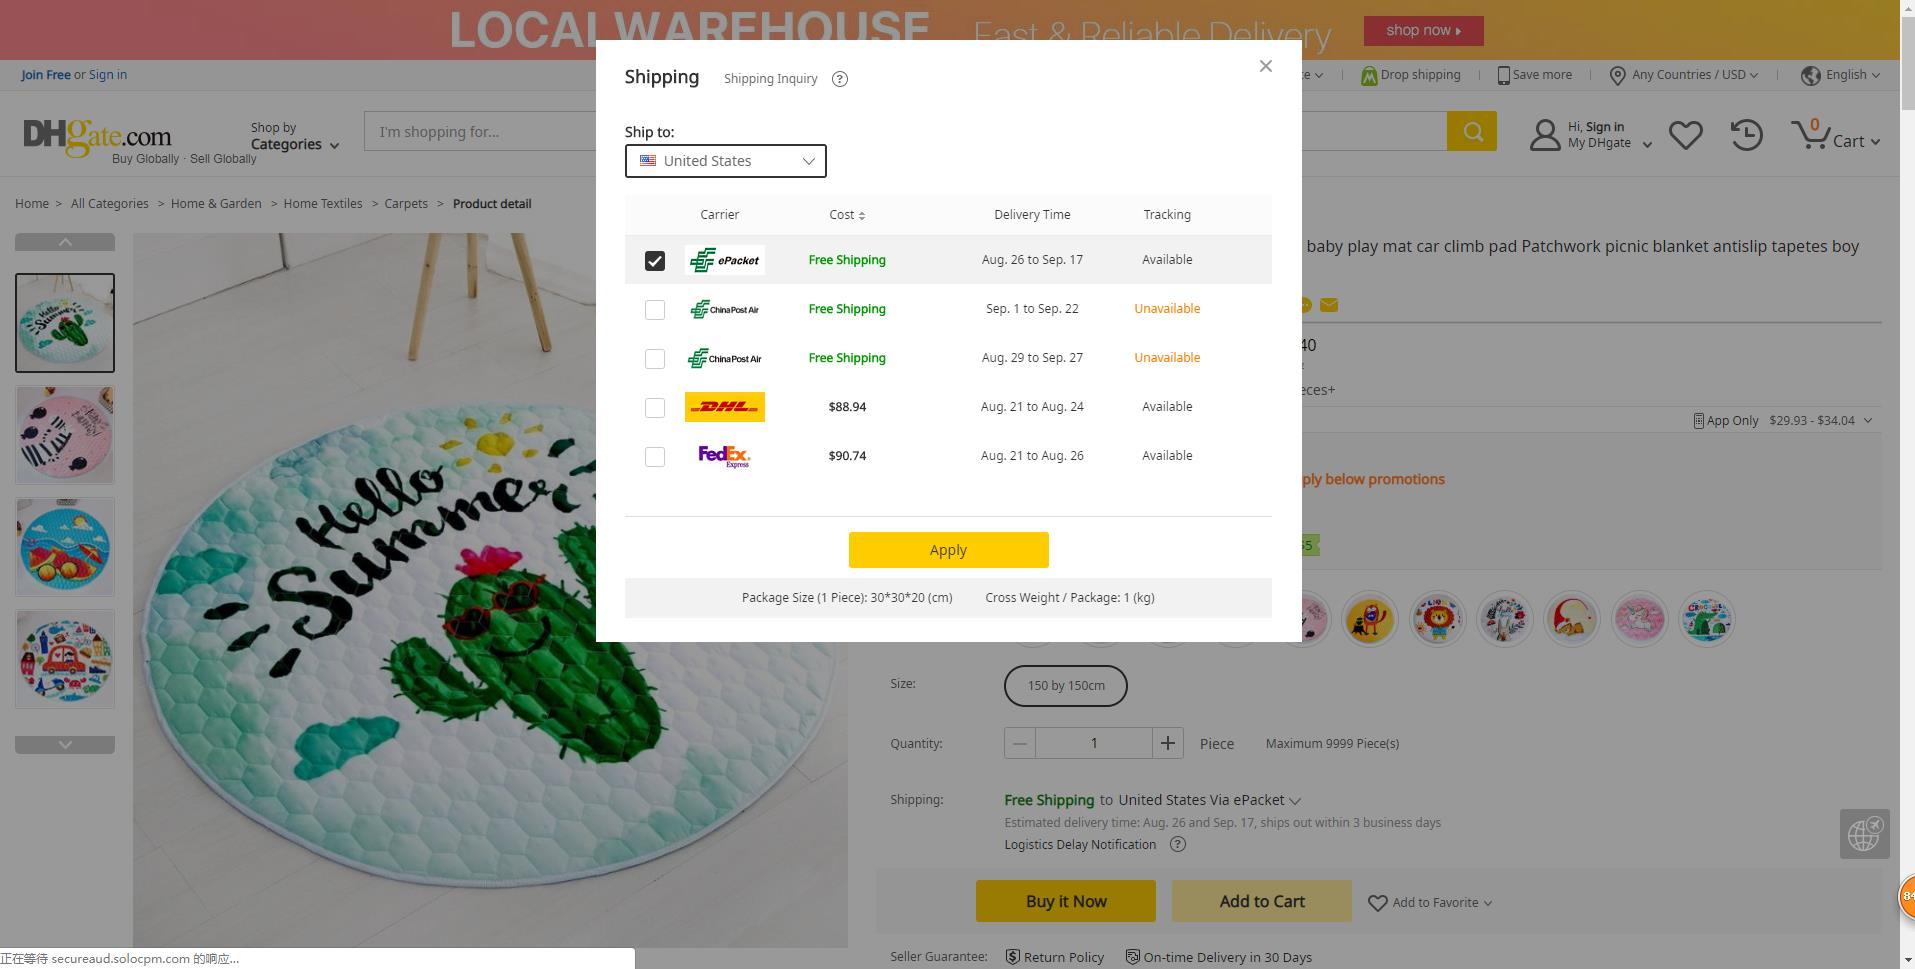 dhgate.com-shipping method